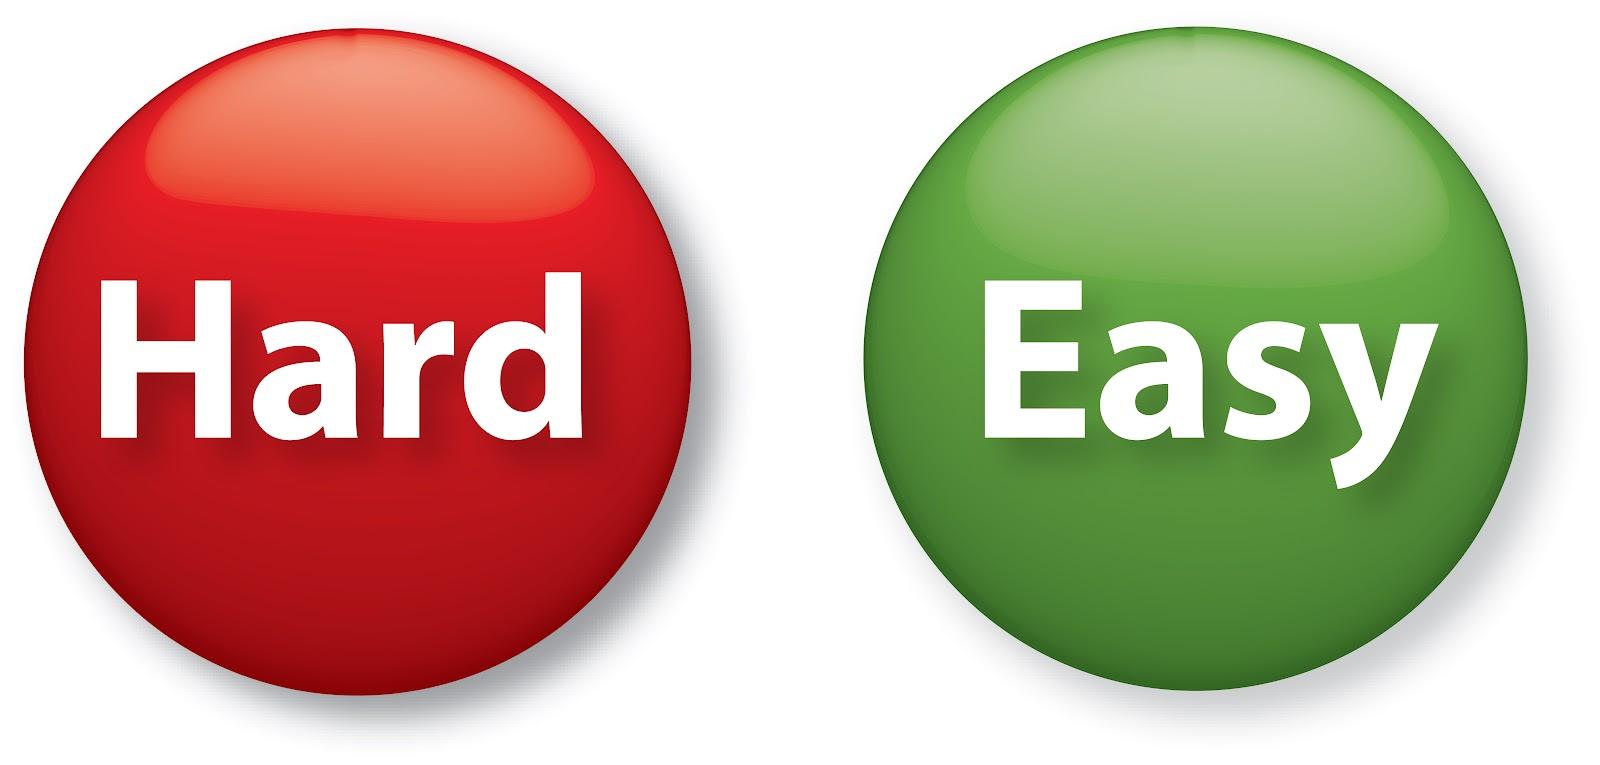 Easy Terms Touse to Publish Better Essays as Sentence Entrepreneurs